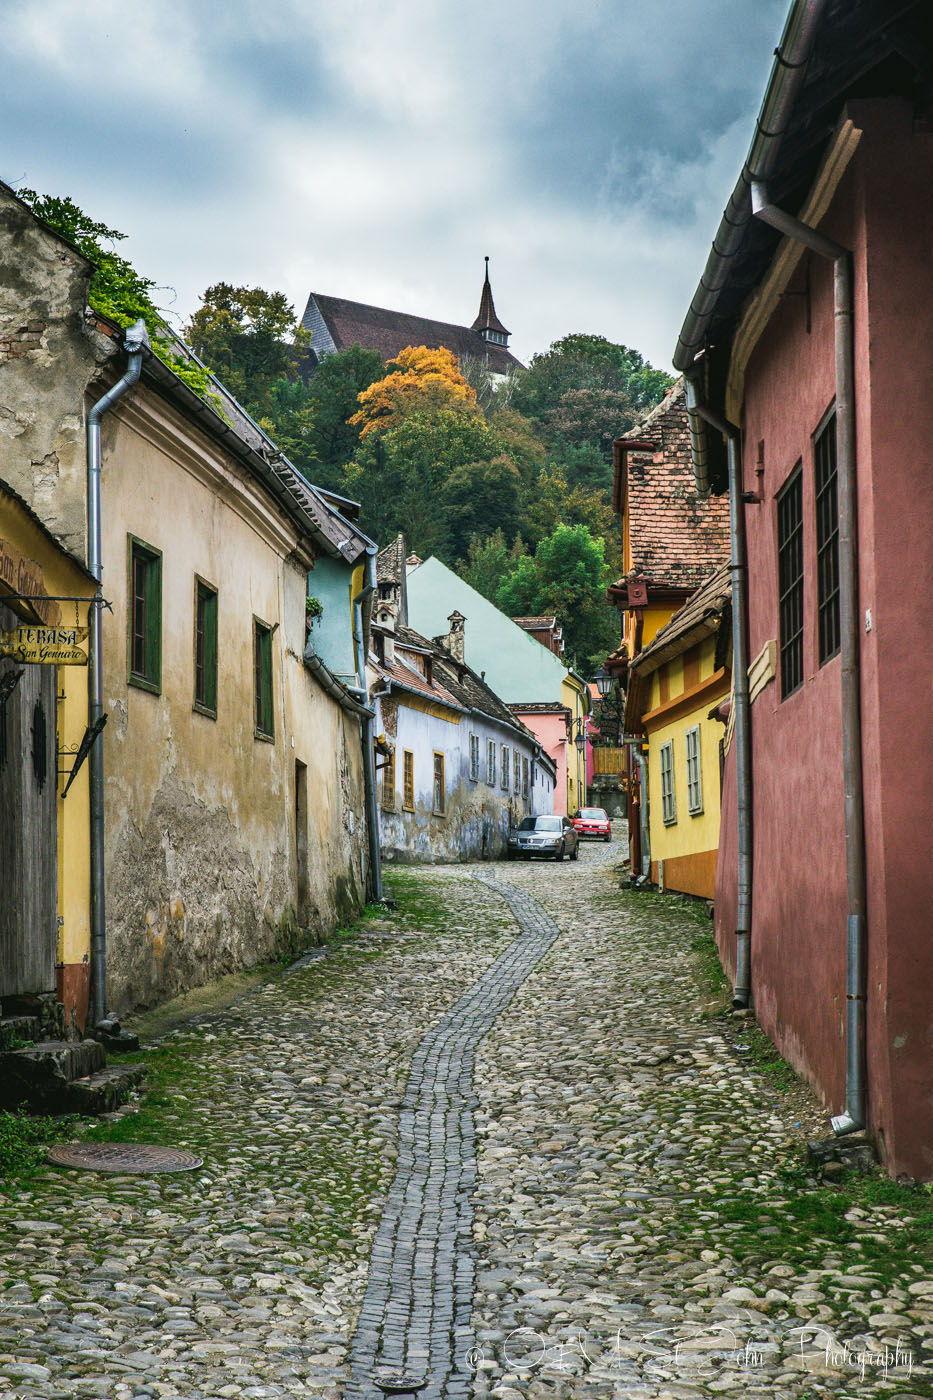 Street in Sighisoara. Romania